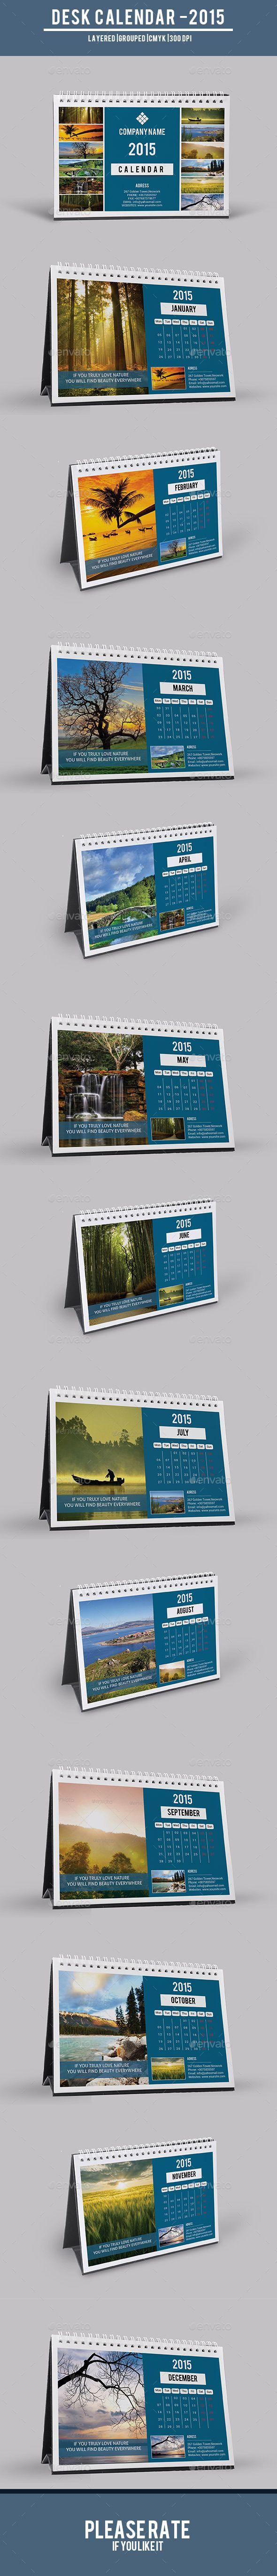 Desk Calendar Template   Buy and Download: http://graphicriver.net/item/desk-calendarv06/9571377?ref=ksioks